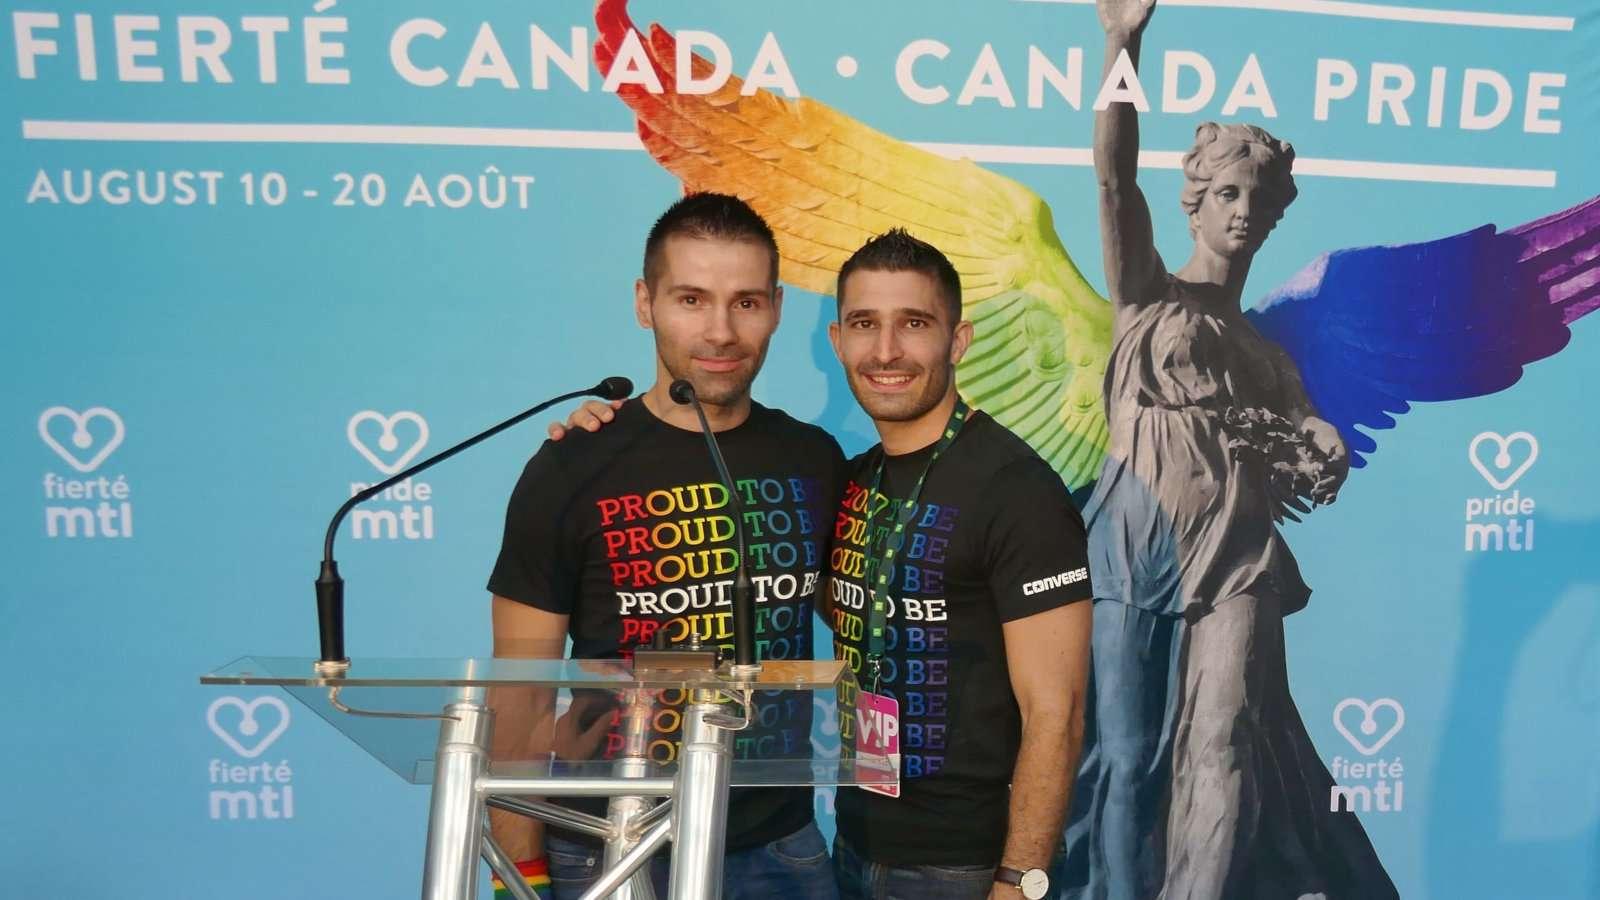 Fierte Canada Pride in Montreal